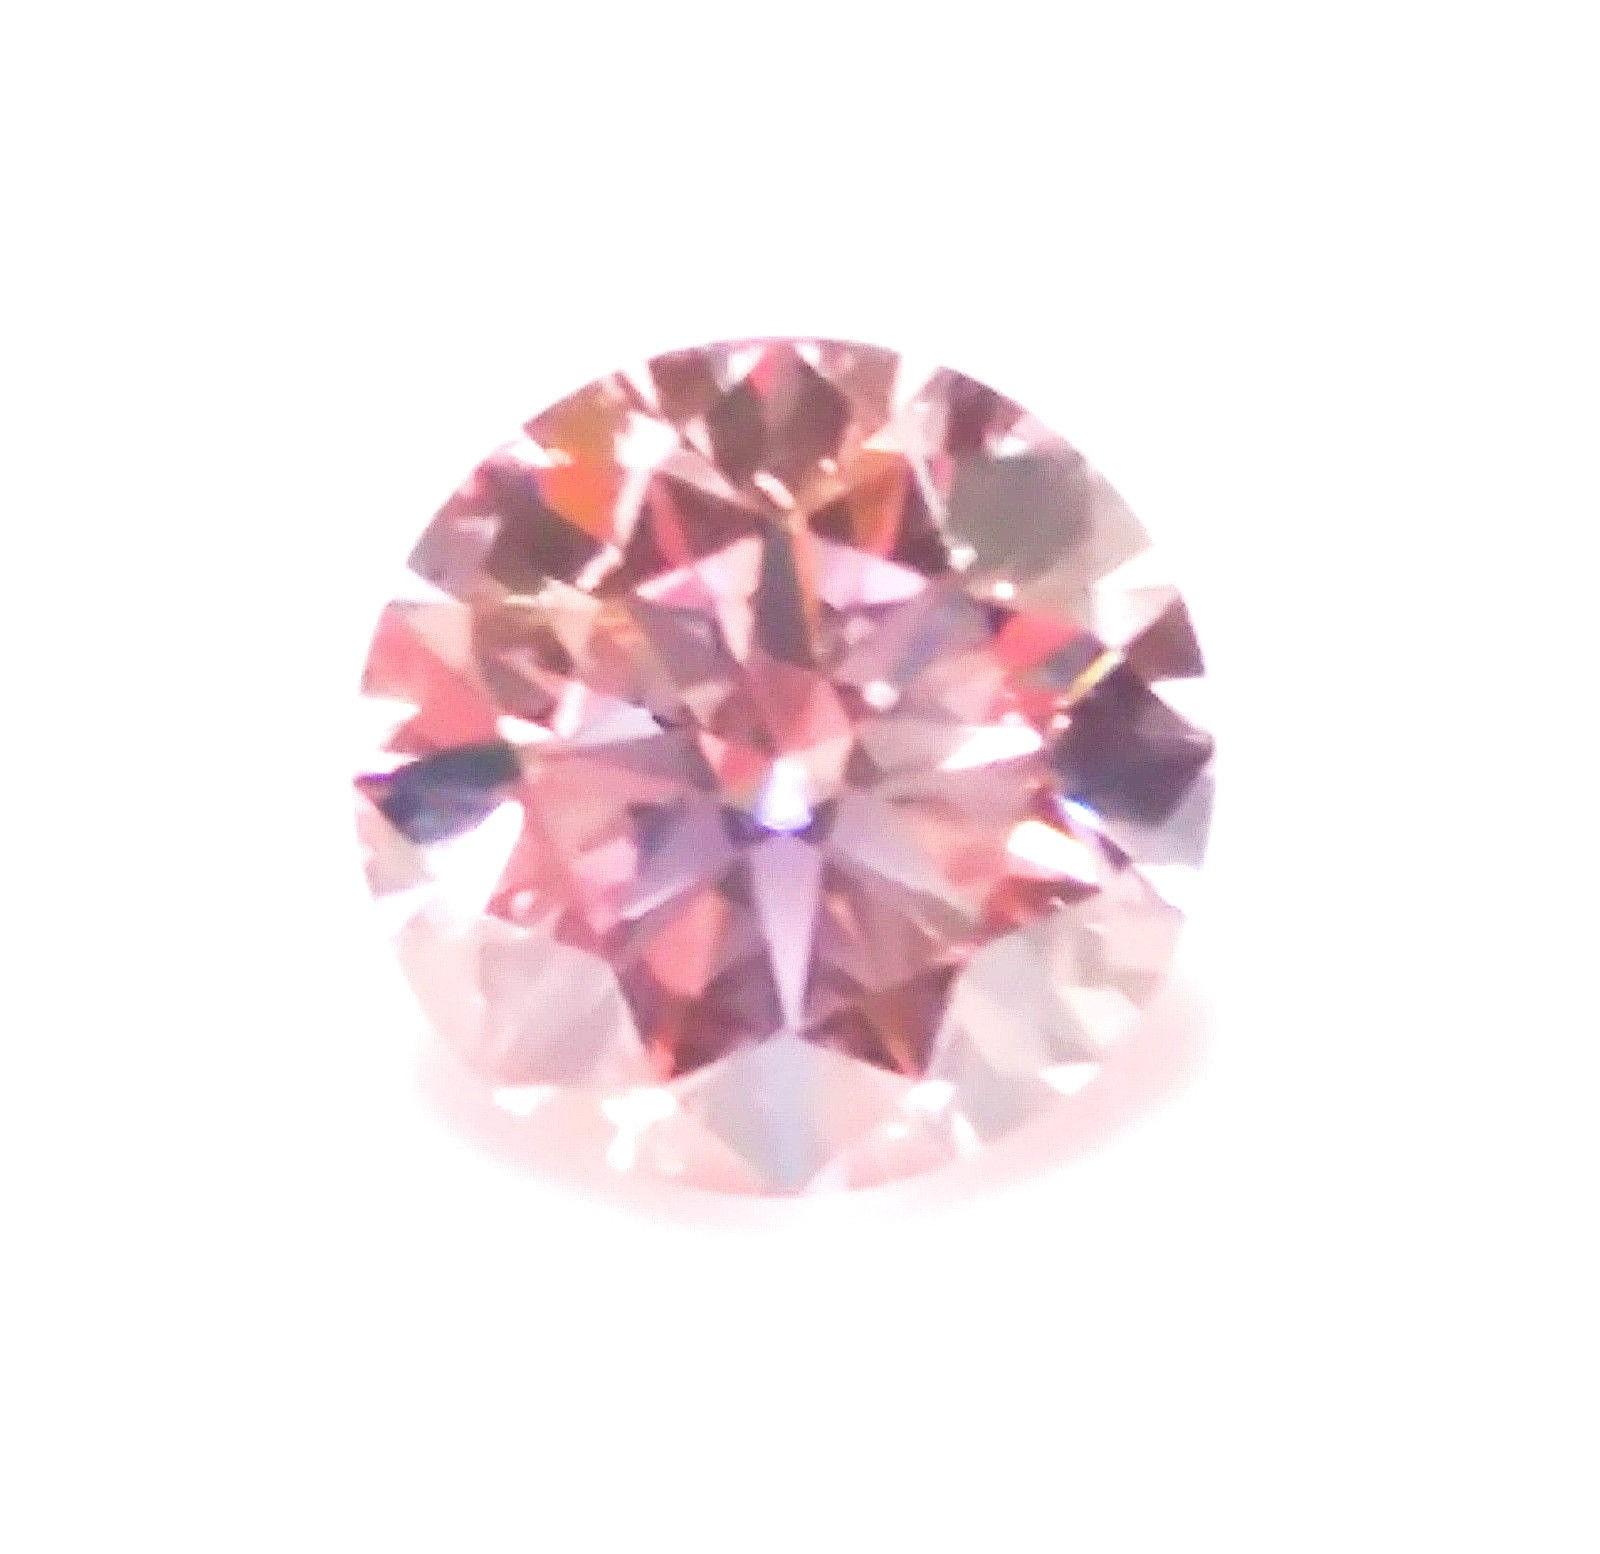 Pink Diamond 0 23ct Argyle Natural Loose Fancy Light